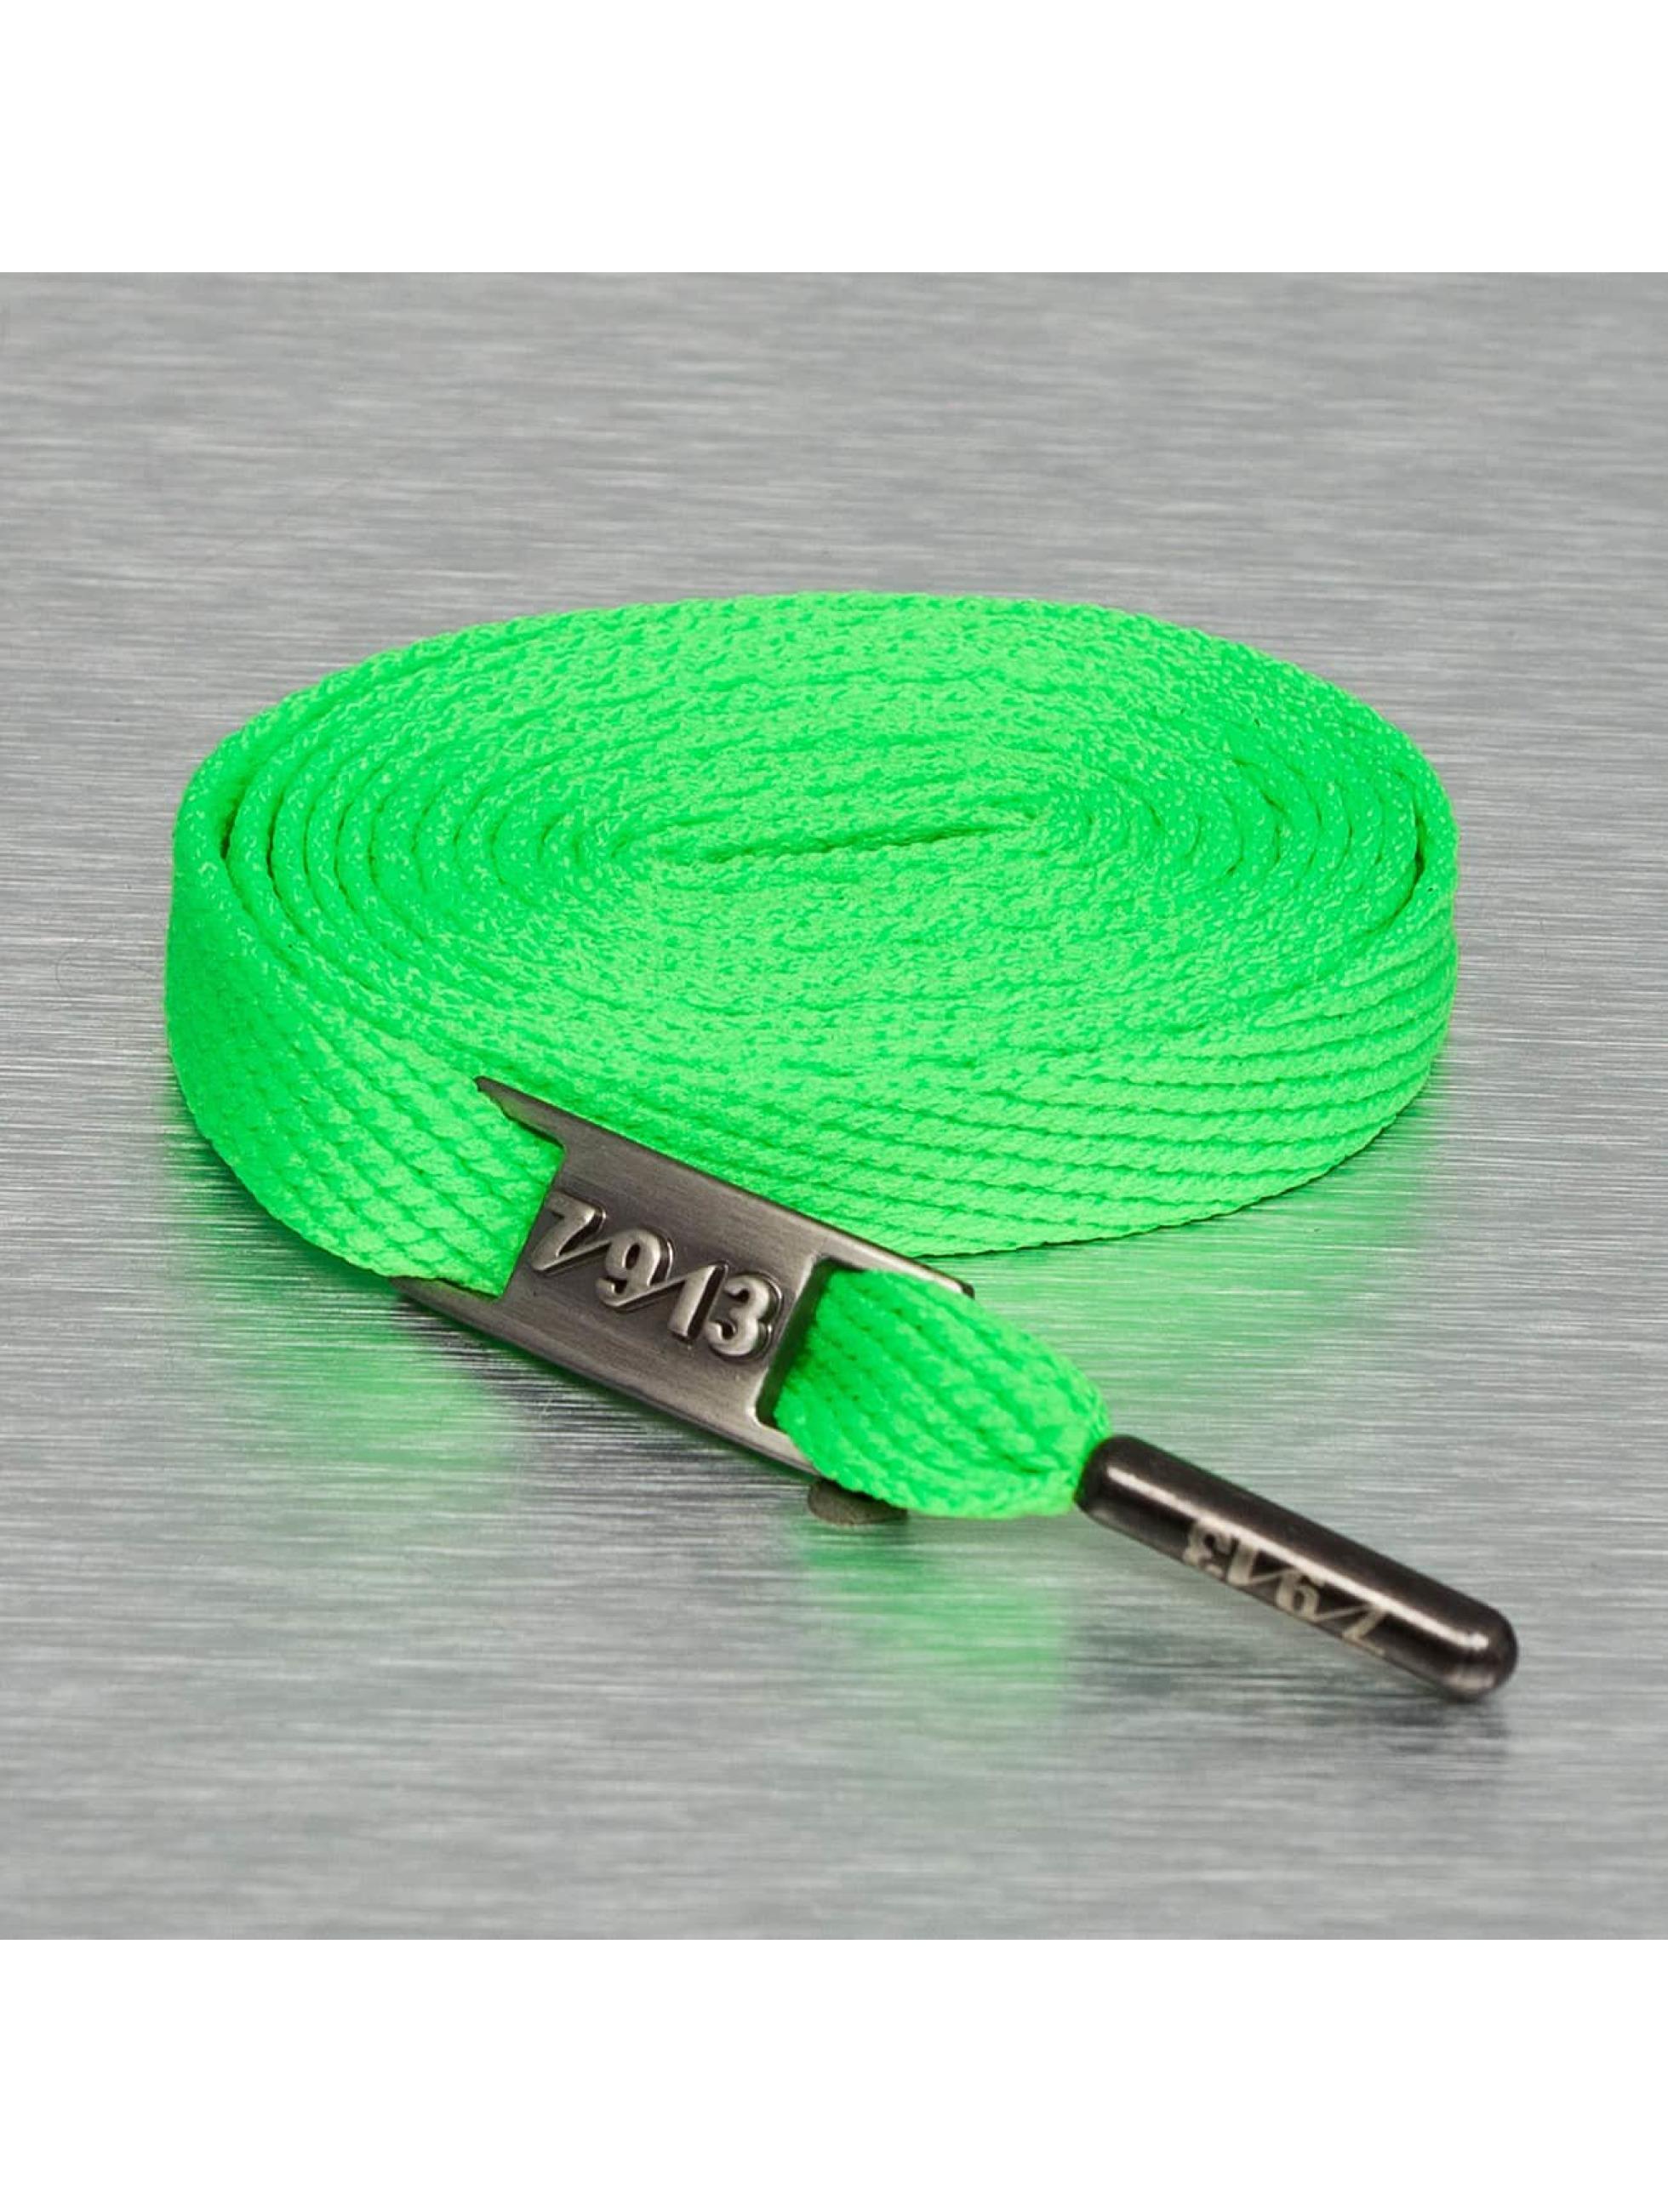 Seven Nine 13 Shoe accessorie Full Metal green